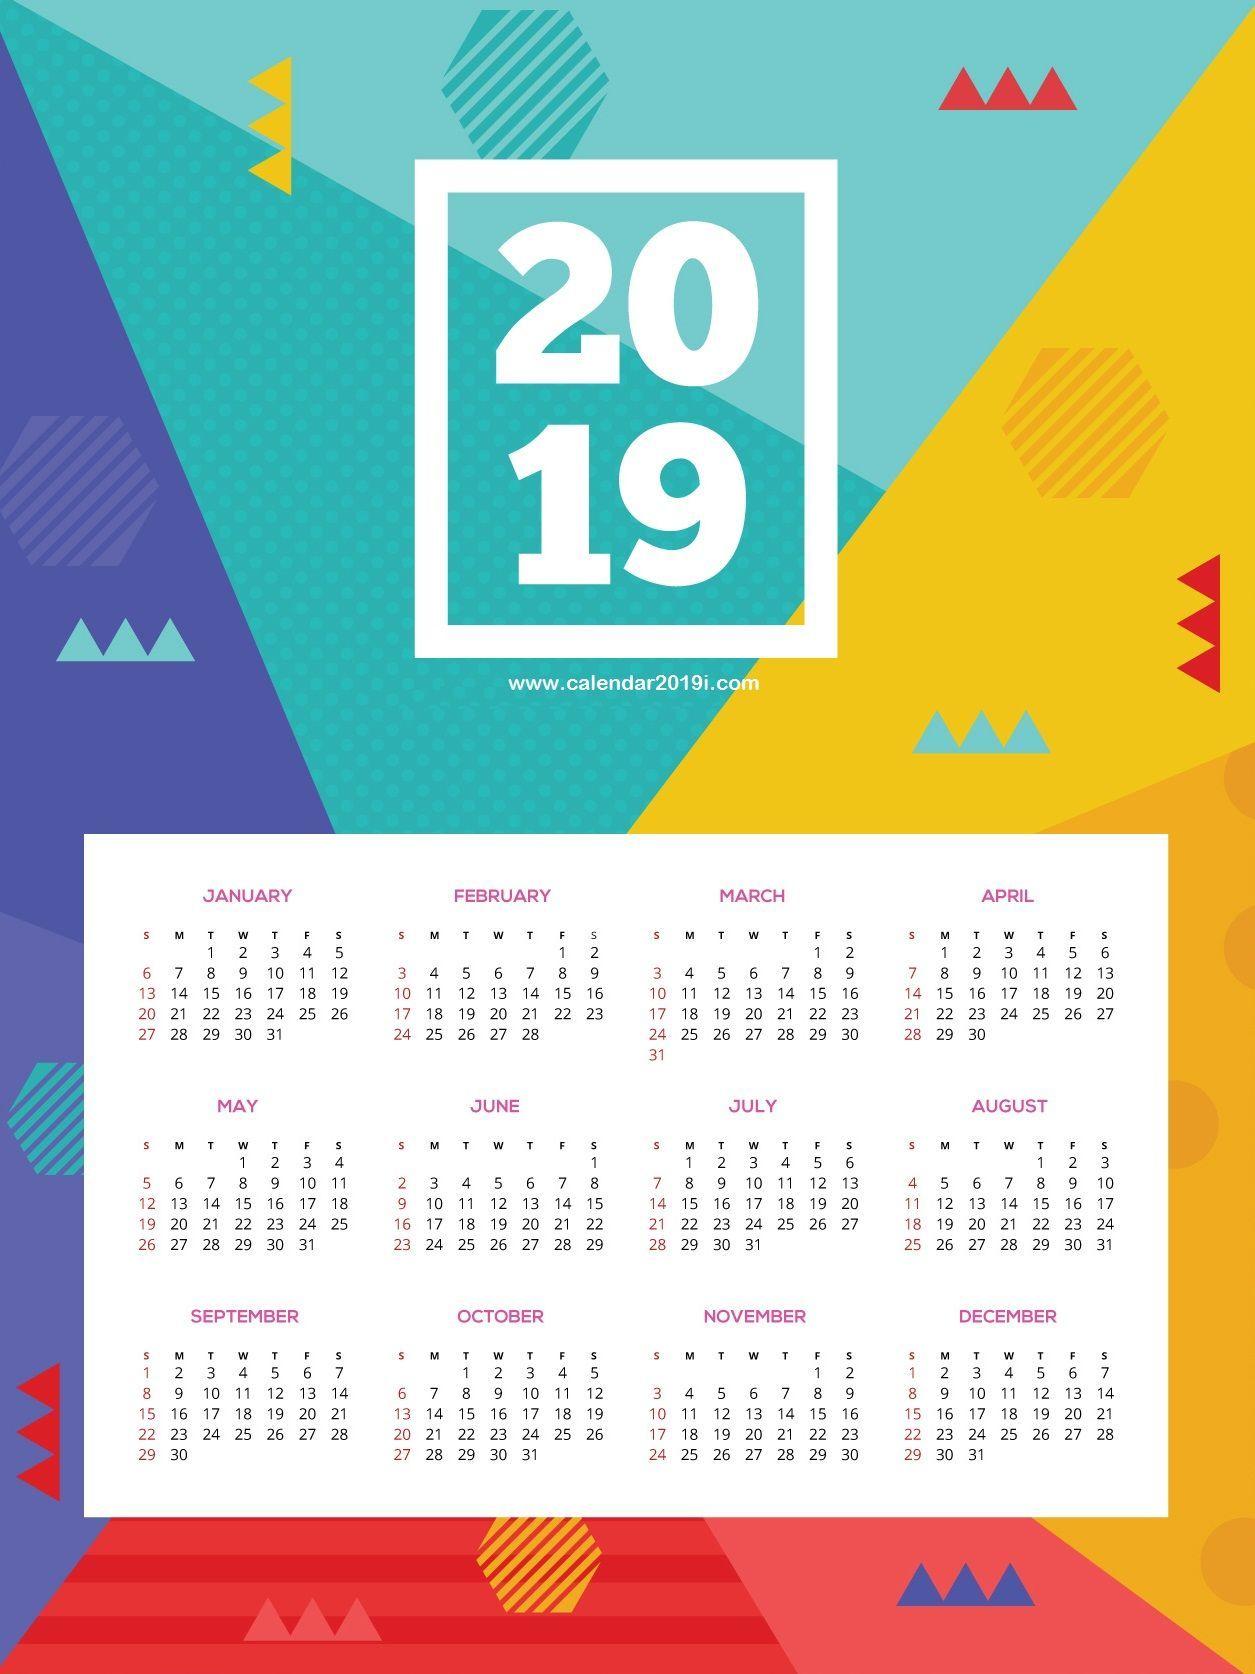 2019 Monthly Wall Calendar Printable Calendar Printables Wall